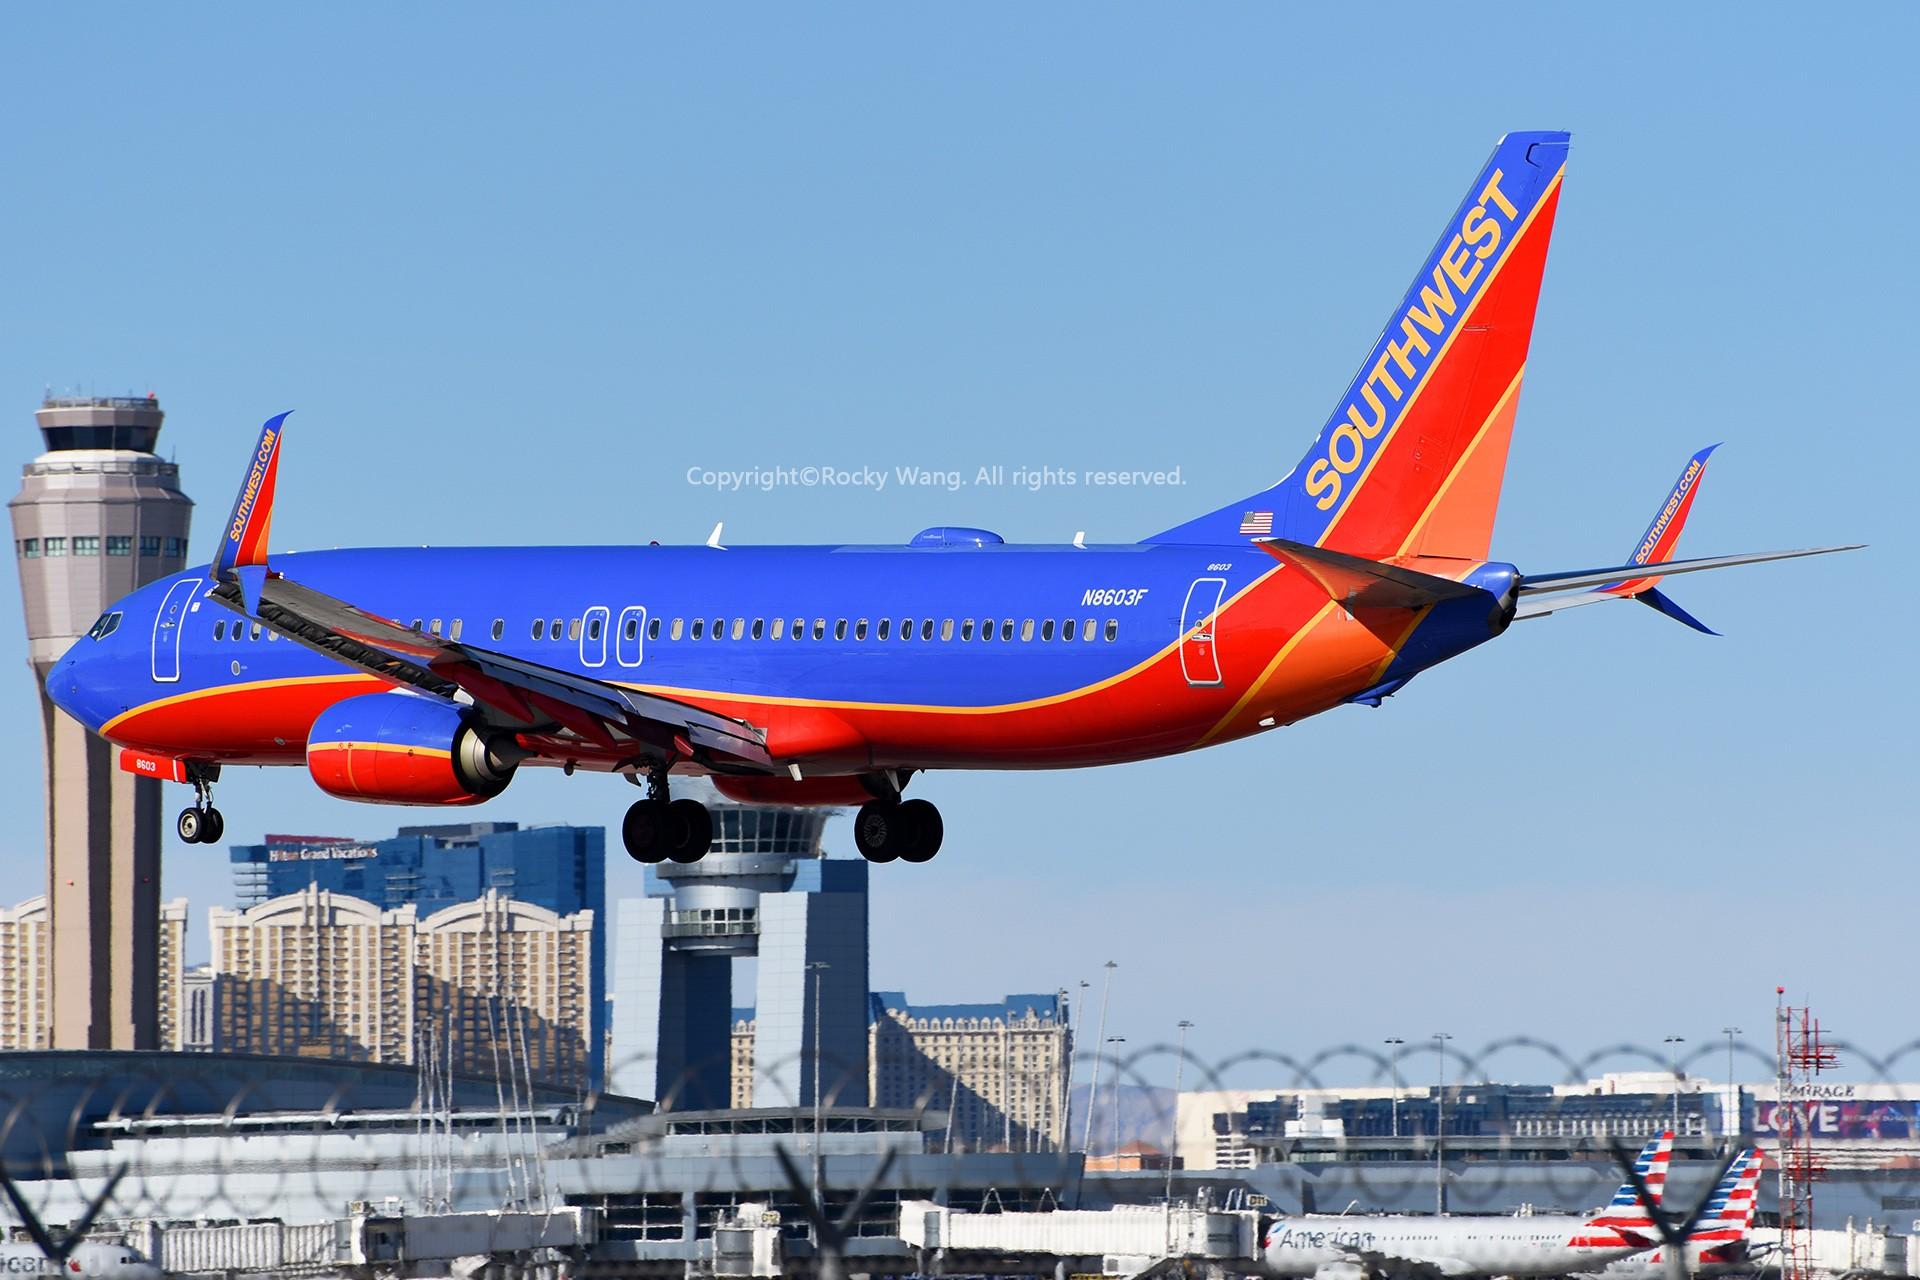 Re:[原创]窄体连连看 BOEING 737-8H4 N8603F 美国拉斯维加斯麦卡伦机场